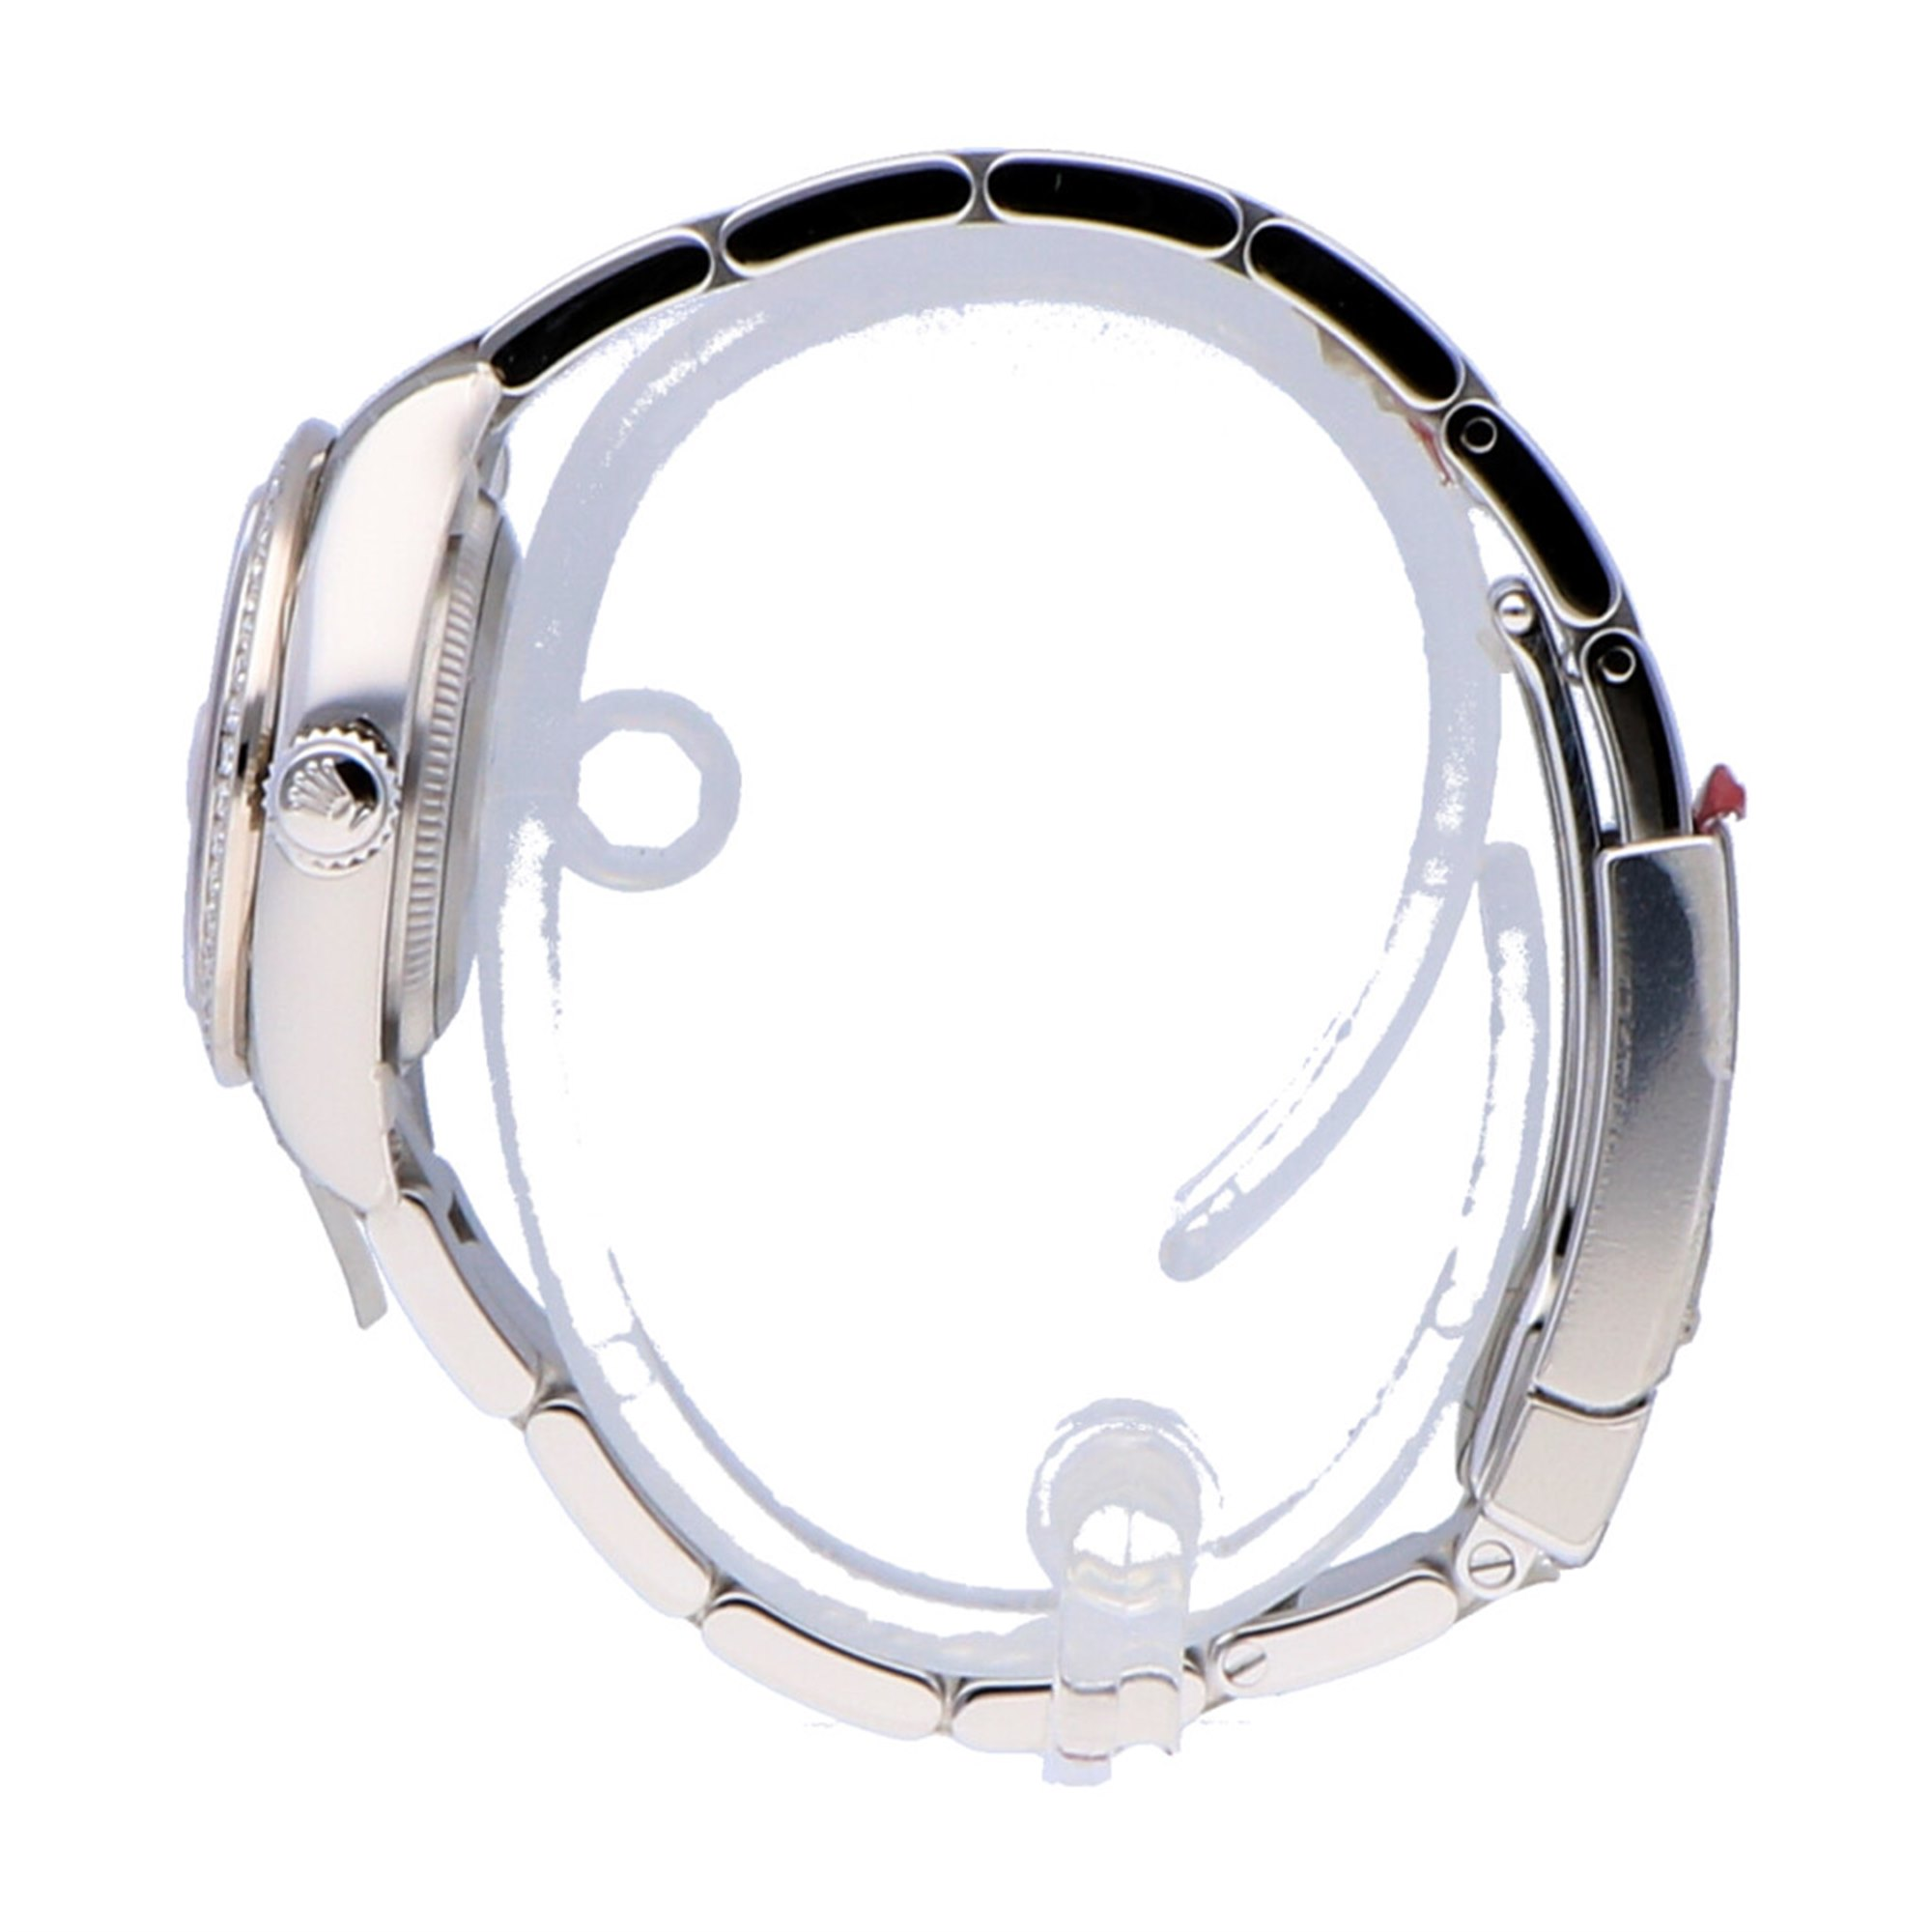 Rolex Datejust Stainless Steel 179384-0020